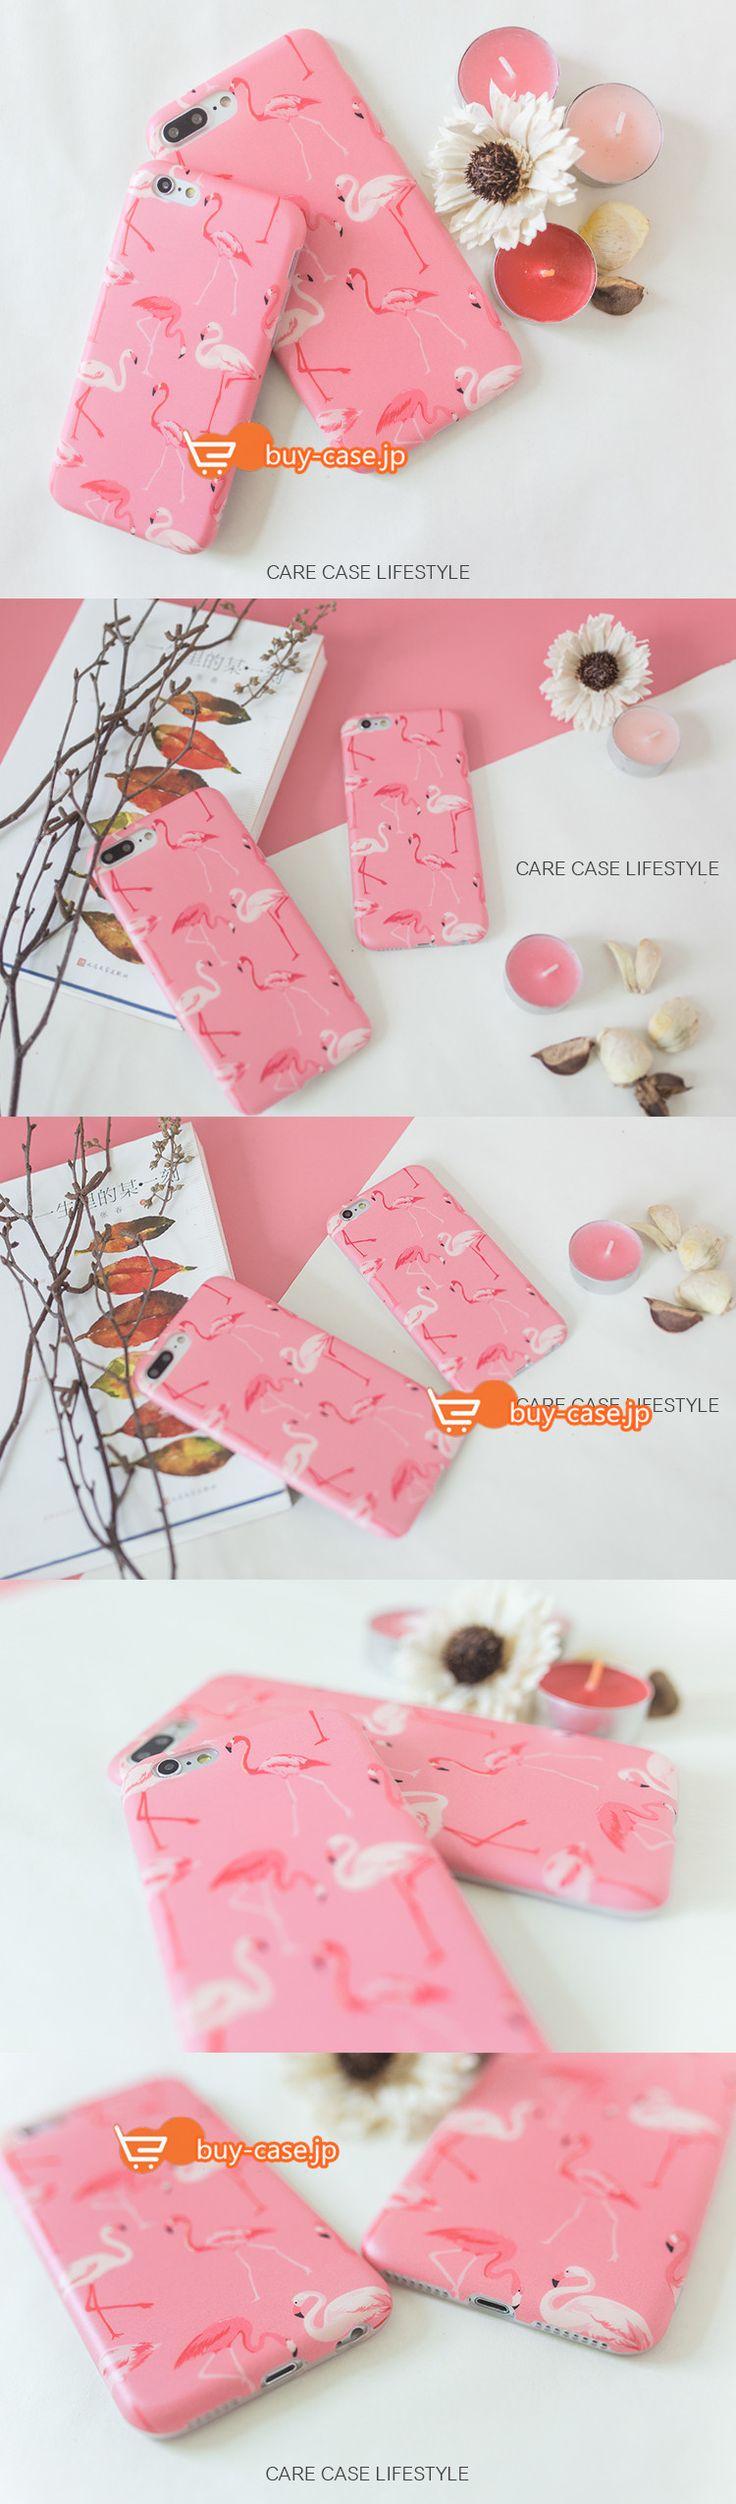 iPhone7オリジナル設計ピンク色粉個性的女性フラミンゴ鳥動物ソフト携帯カバー アイフォン6s/67plusケース